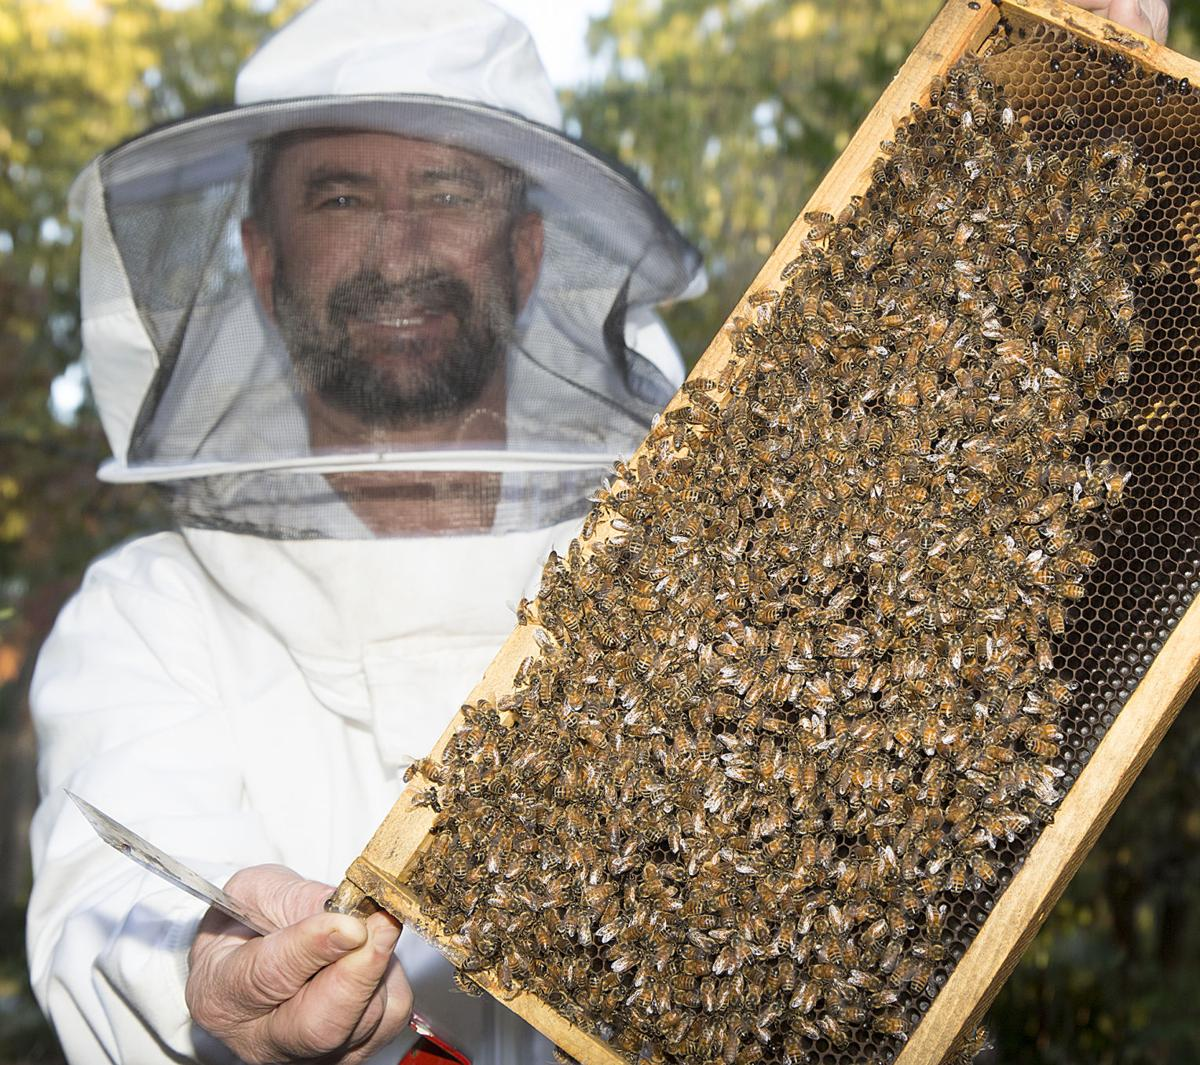 marietta backyard beekeeper makes liquid gold for annual cherokee